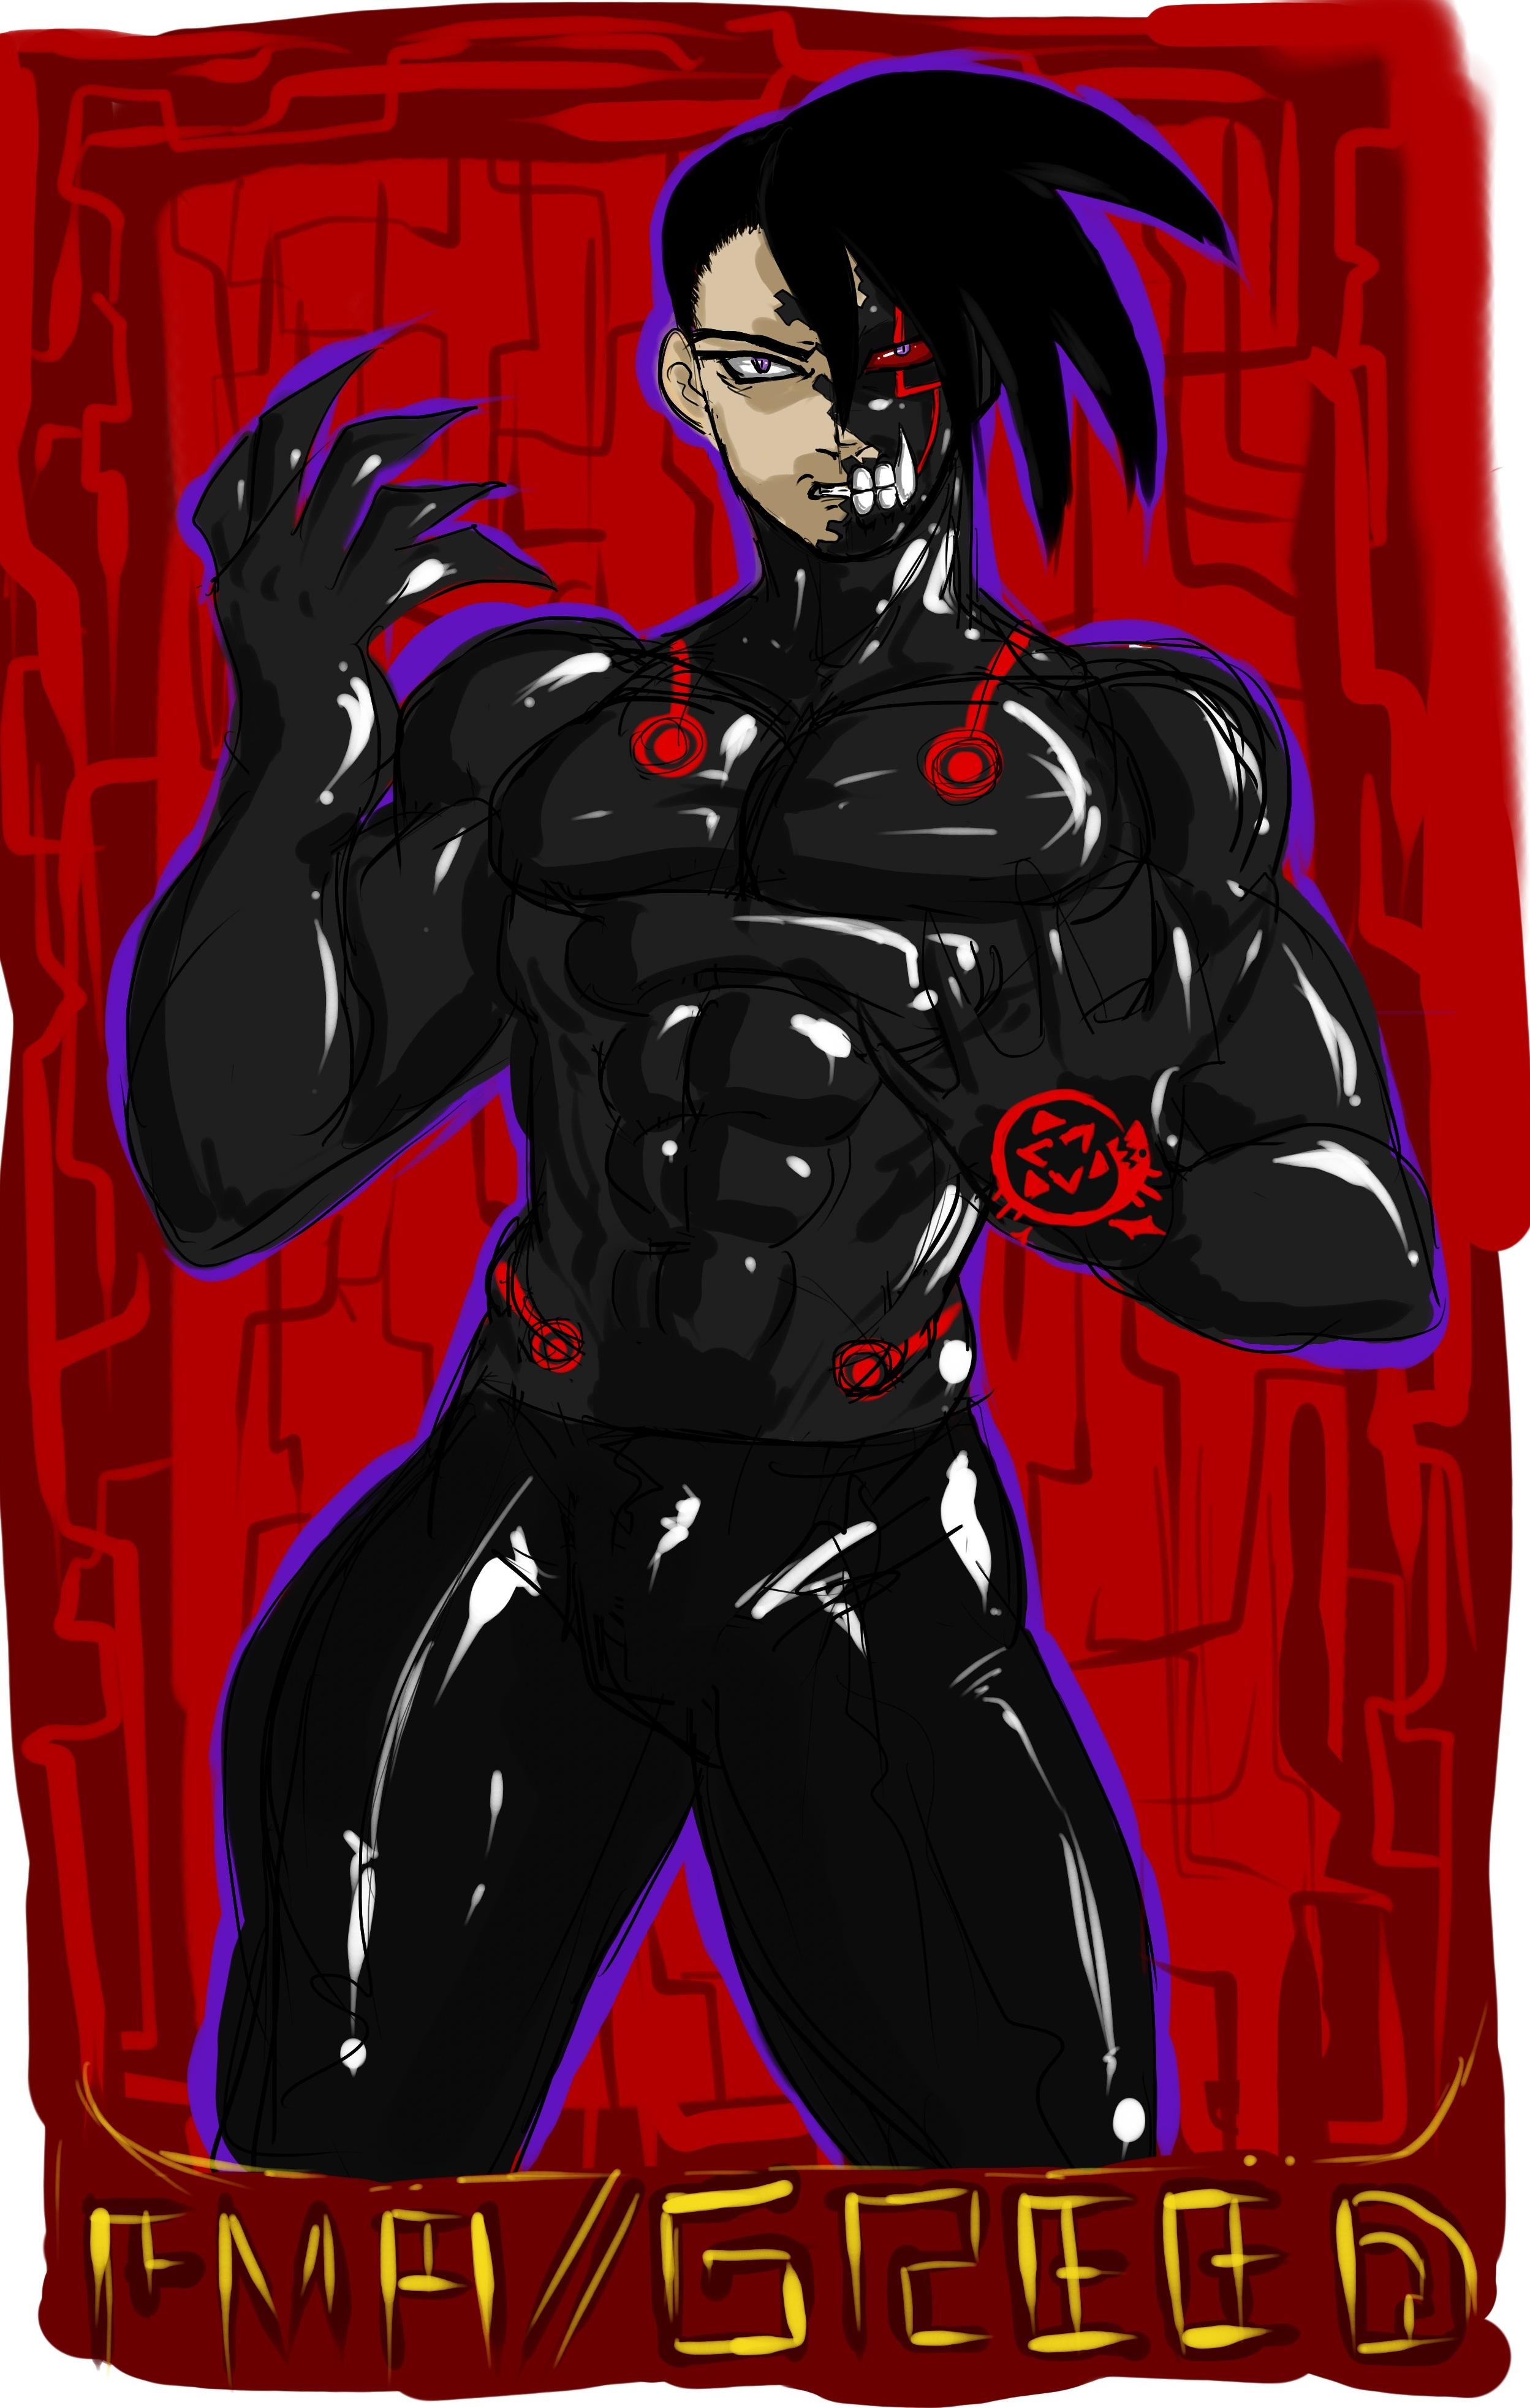 Greed-Ling Fullmetal Alchemist (Armor) by LorGistamanRakk ...